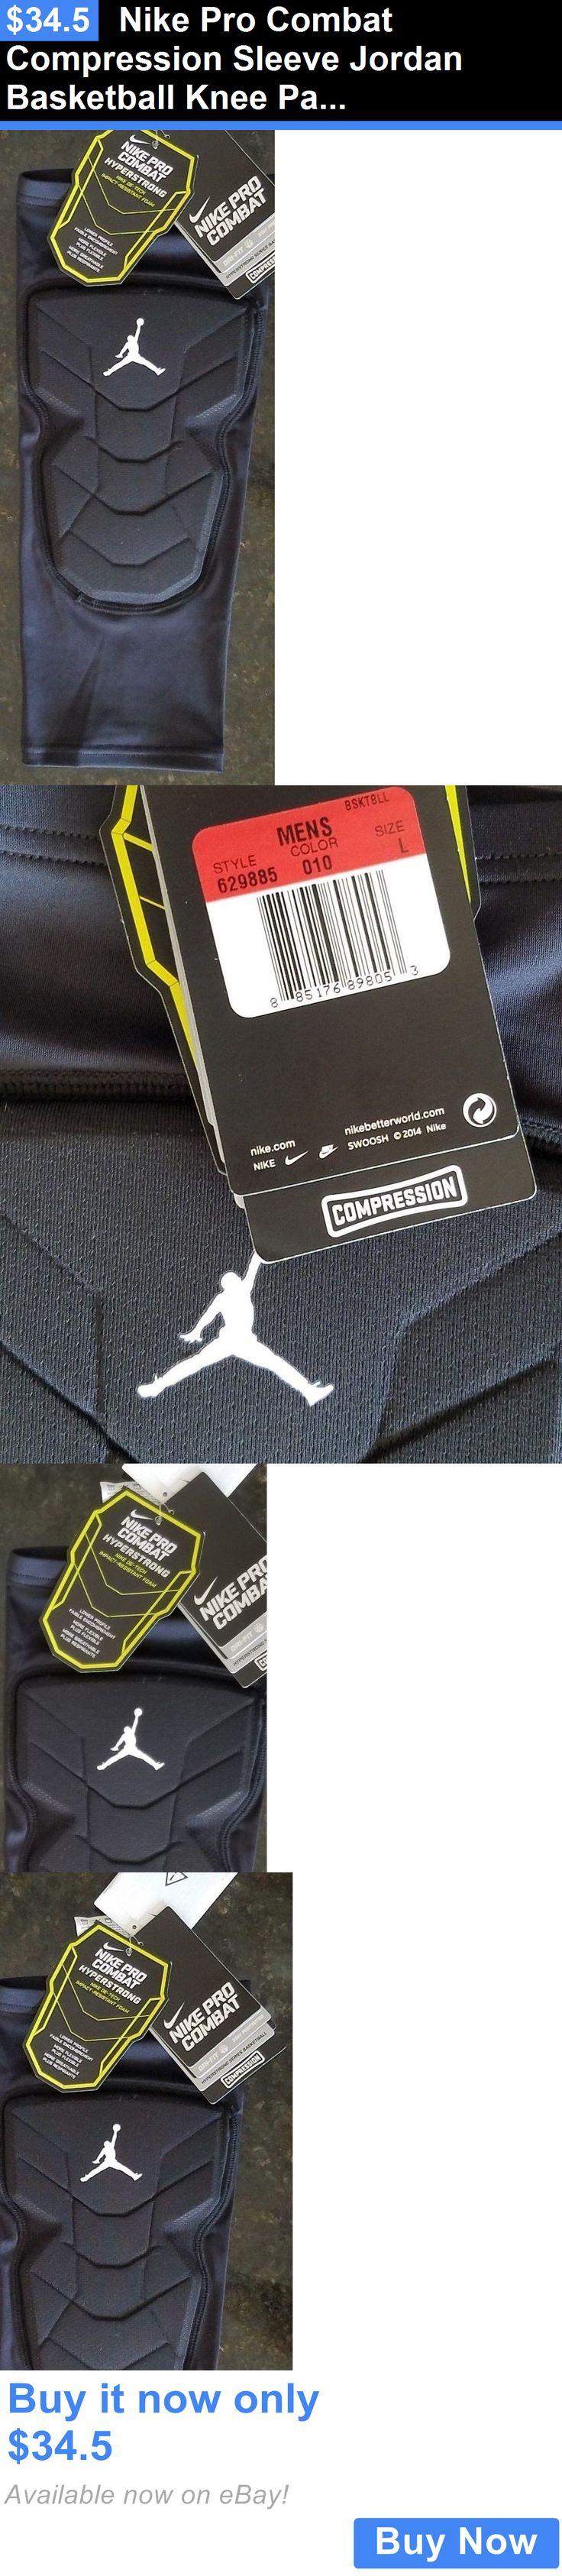 Basketball nike pro combat compression sleeve jordan